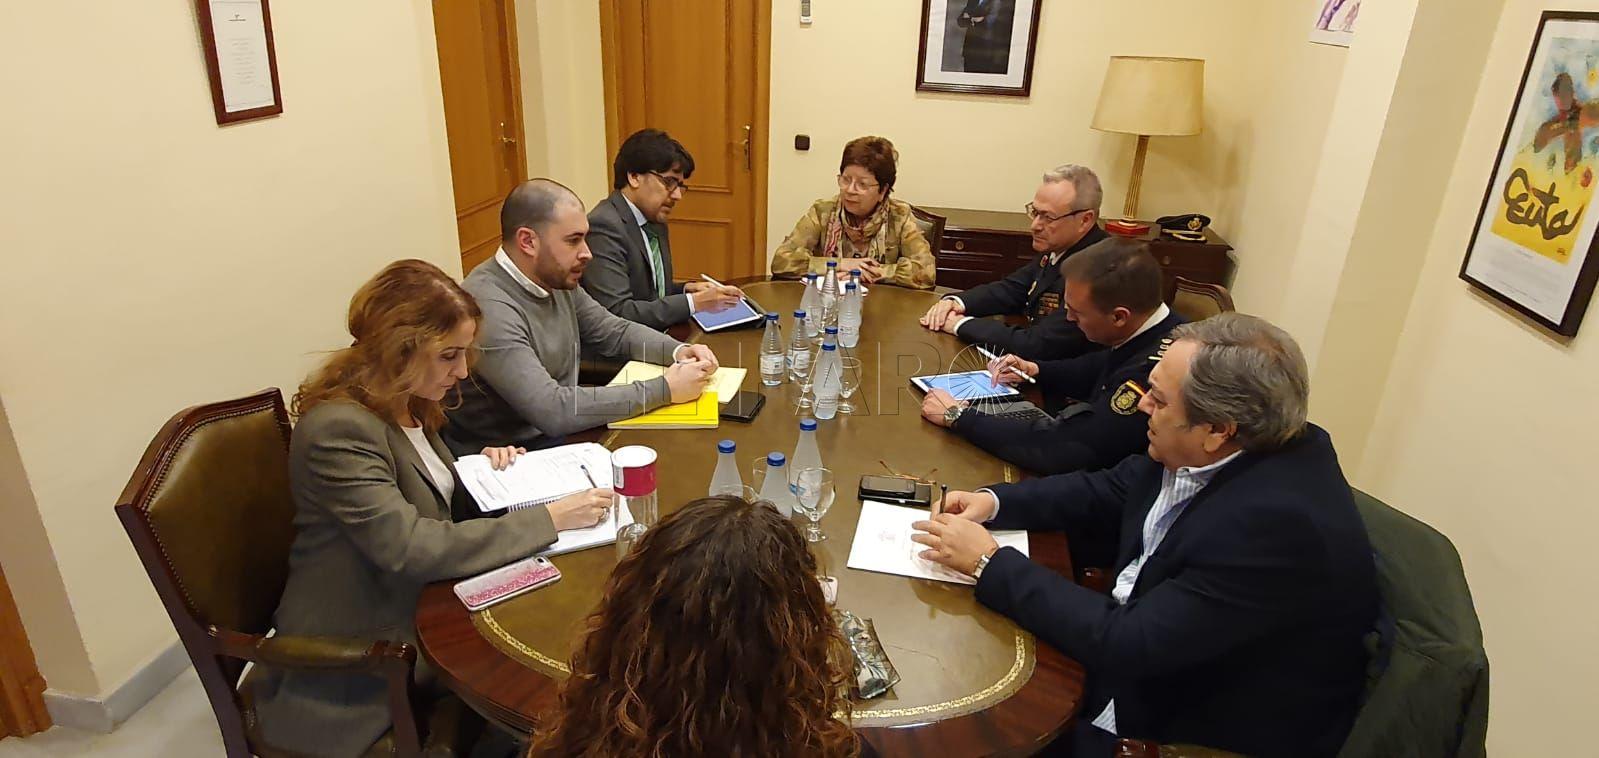 reunion-delegacion-extranjeria-titulos-viaje